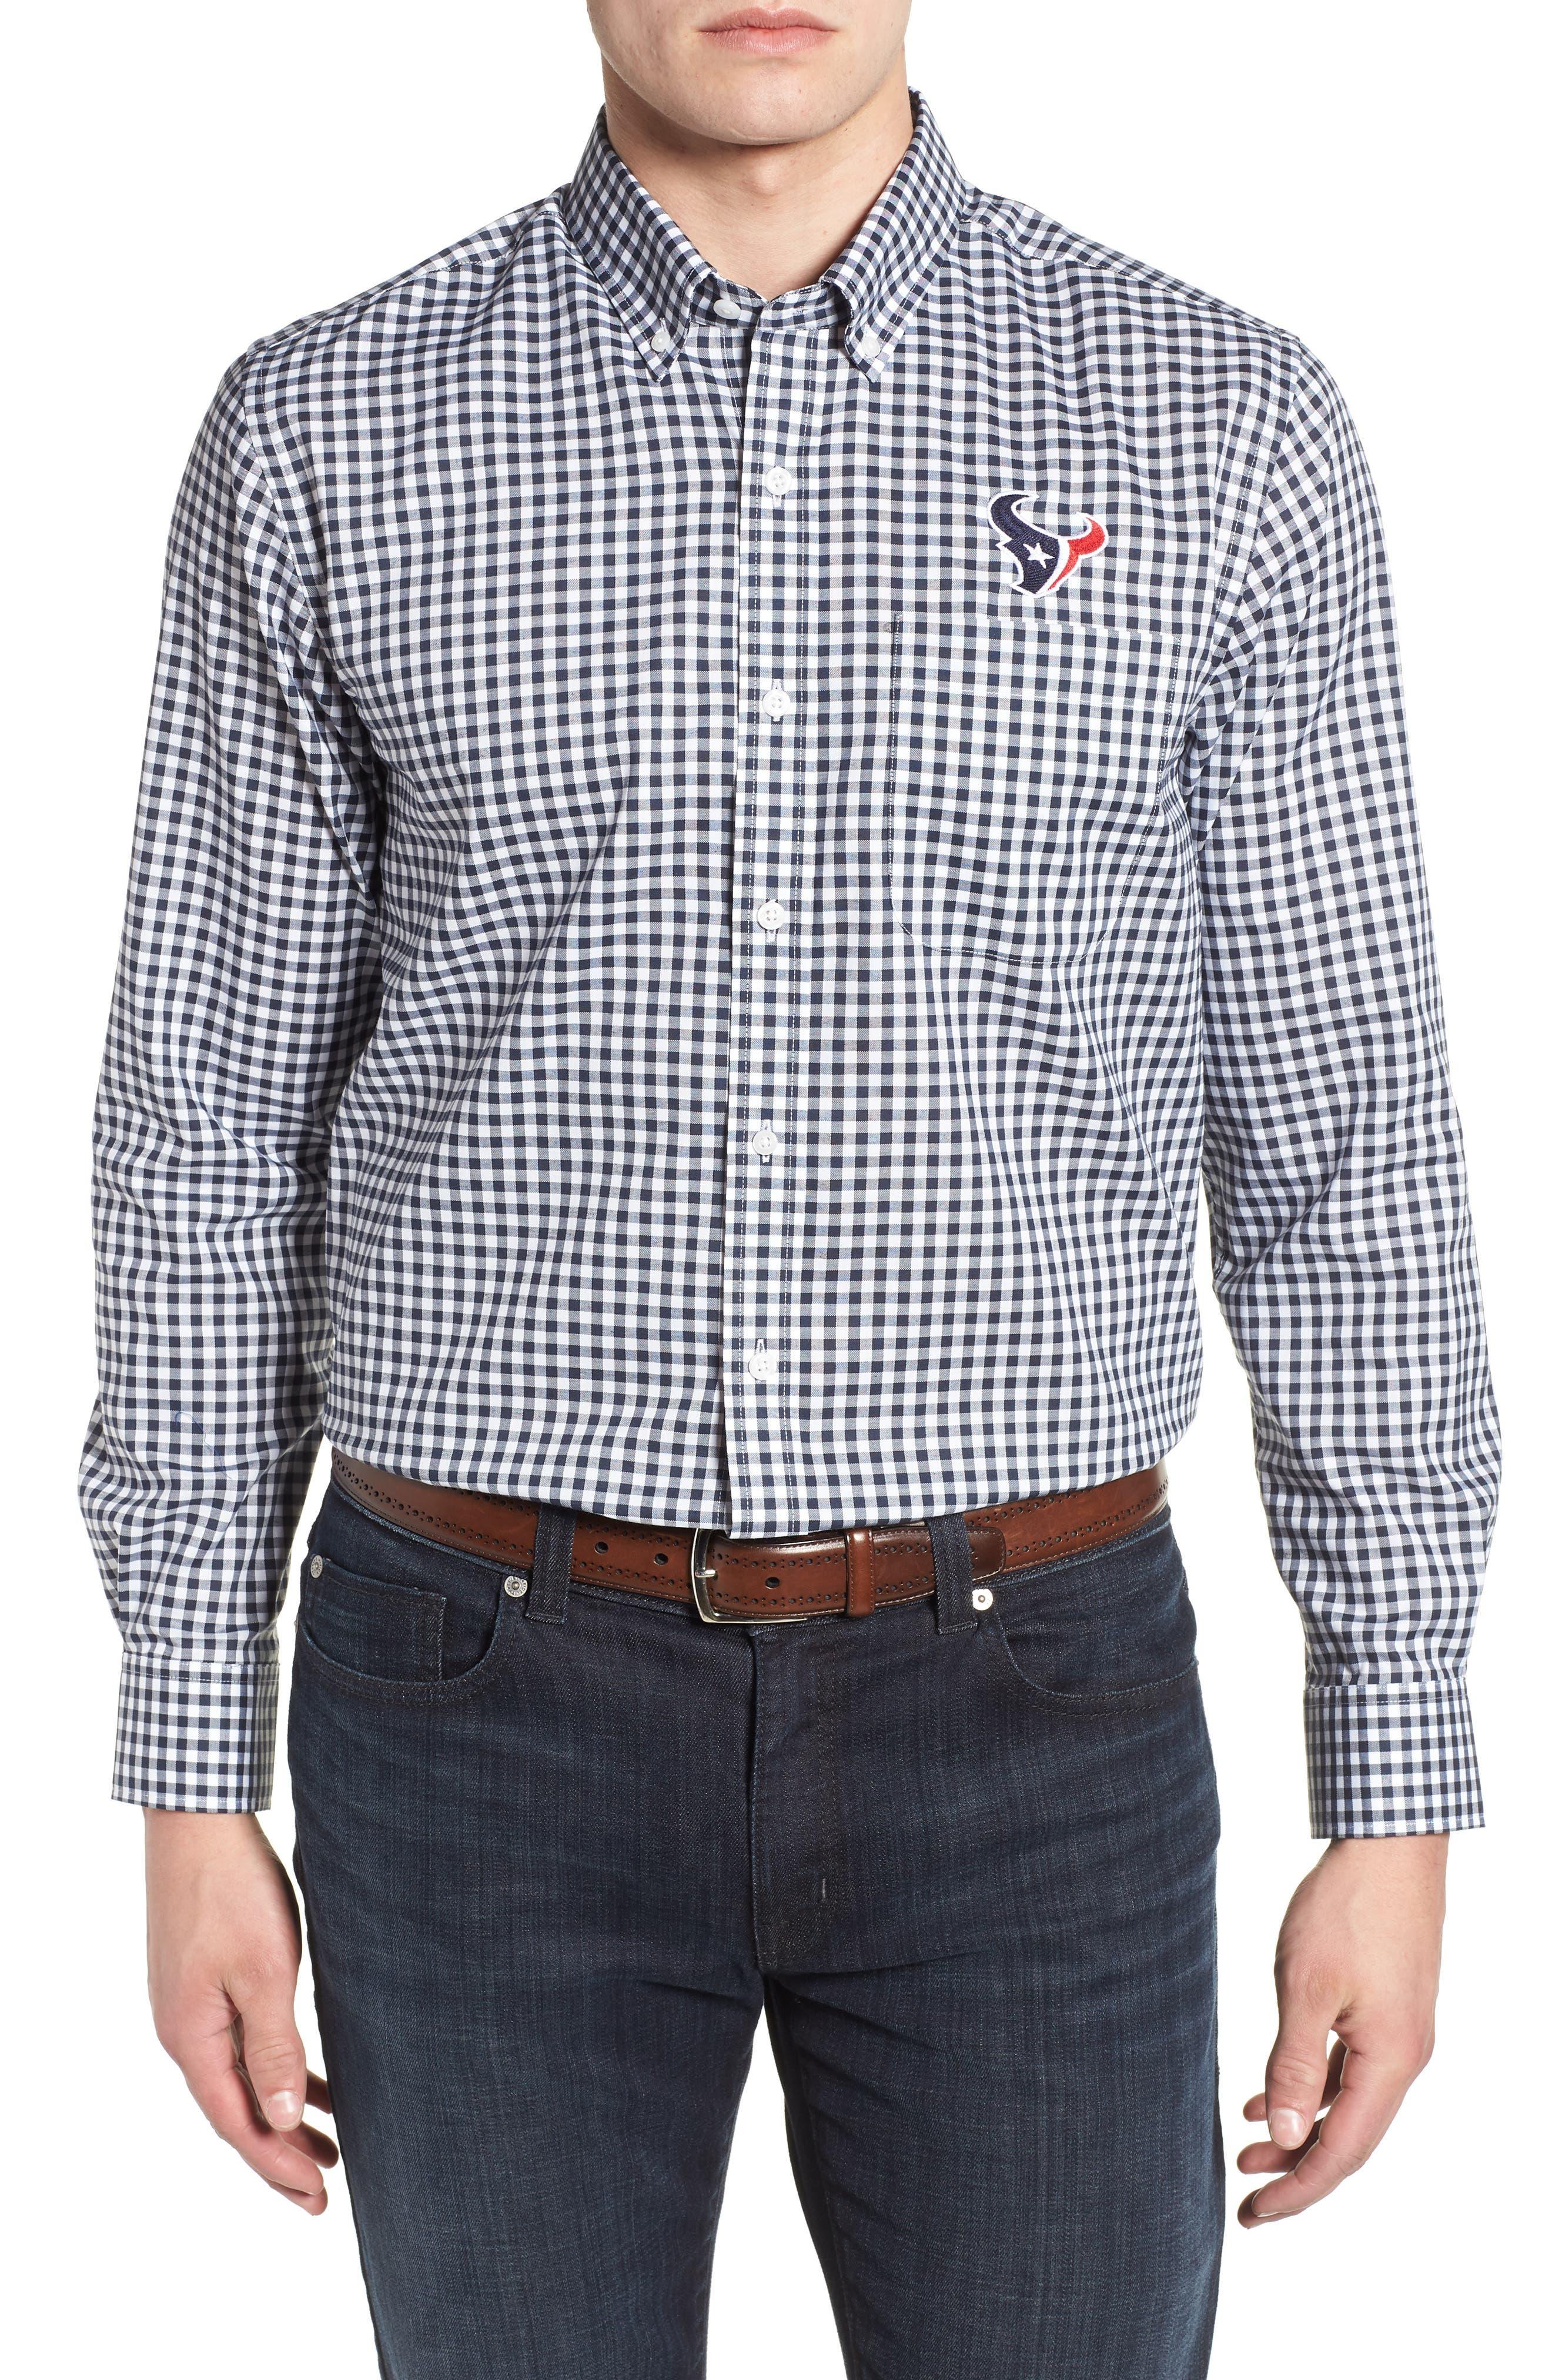 League Houston Texans Regular Fit Shirt,                         Main,                         color, LIBERTY NAVY